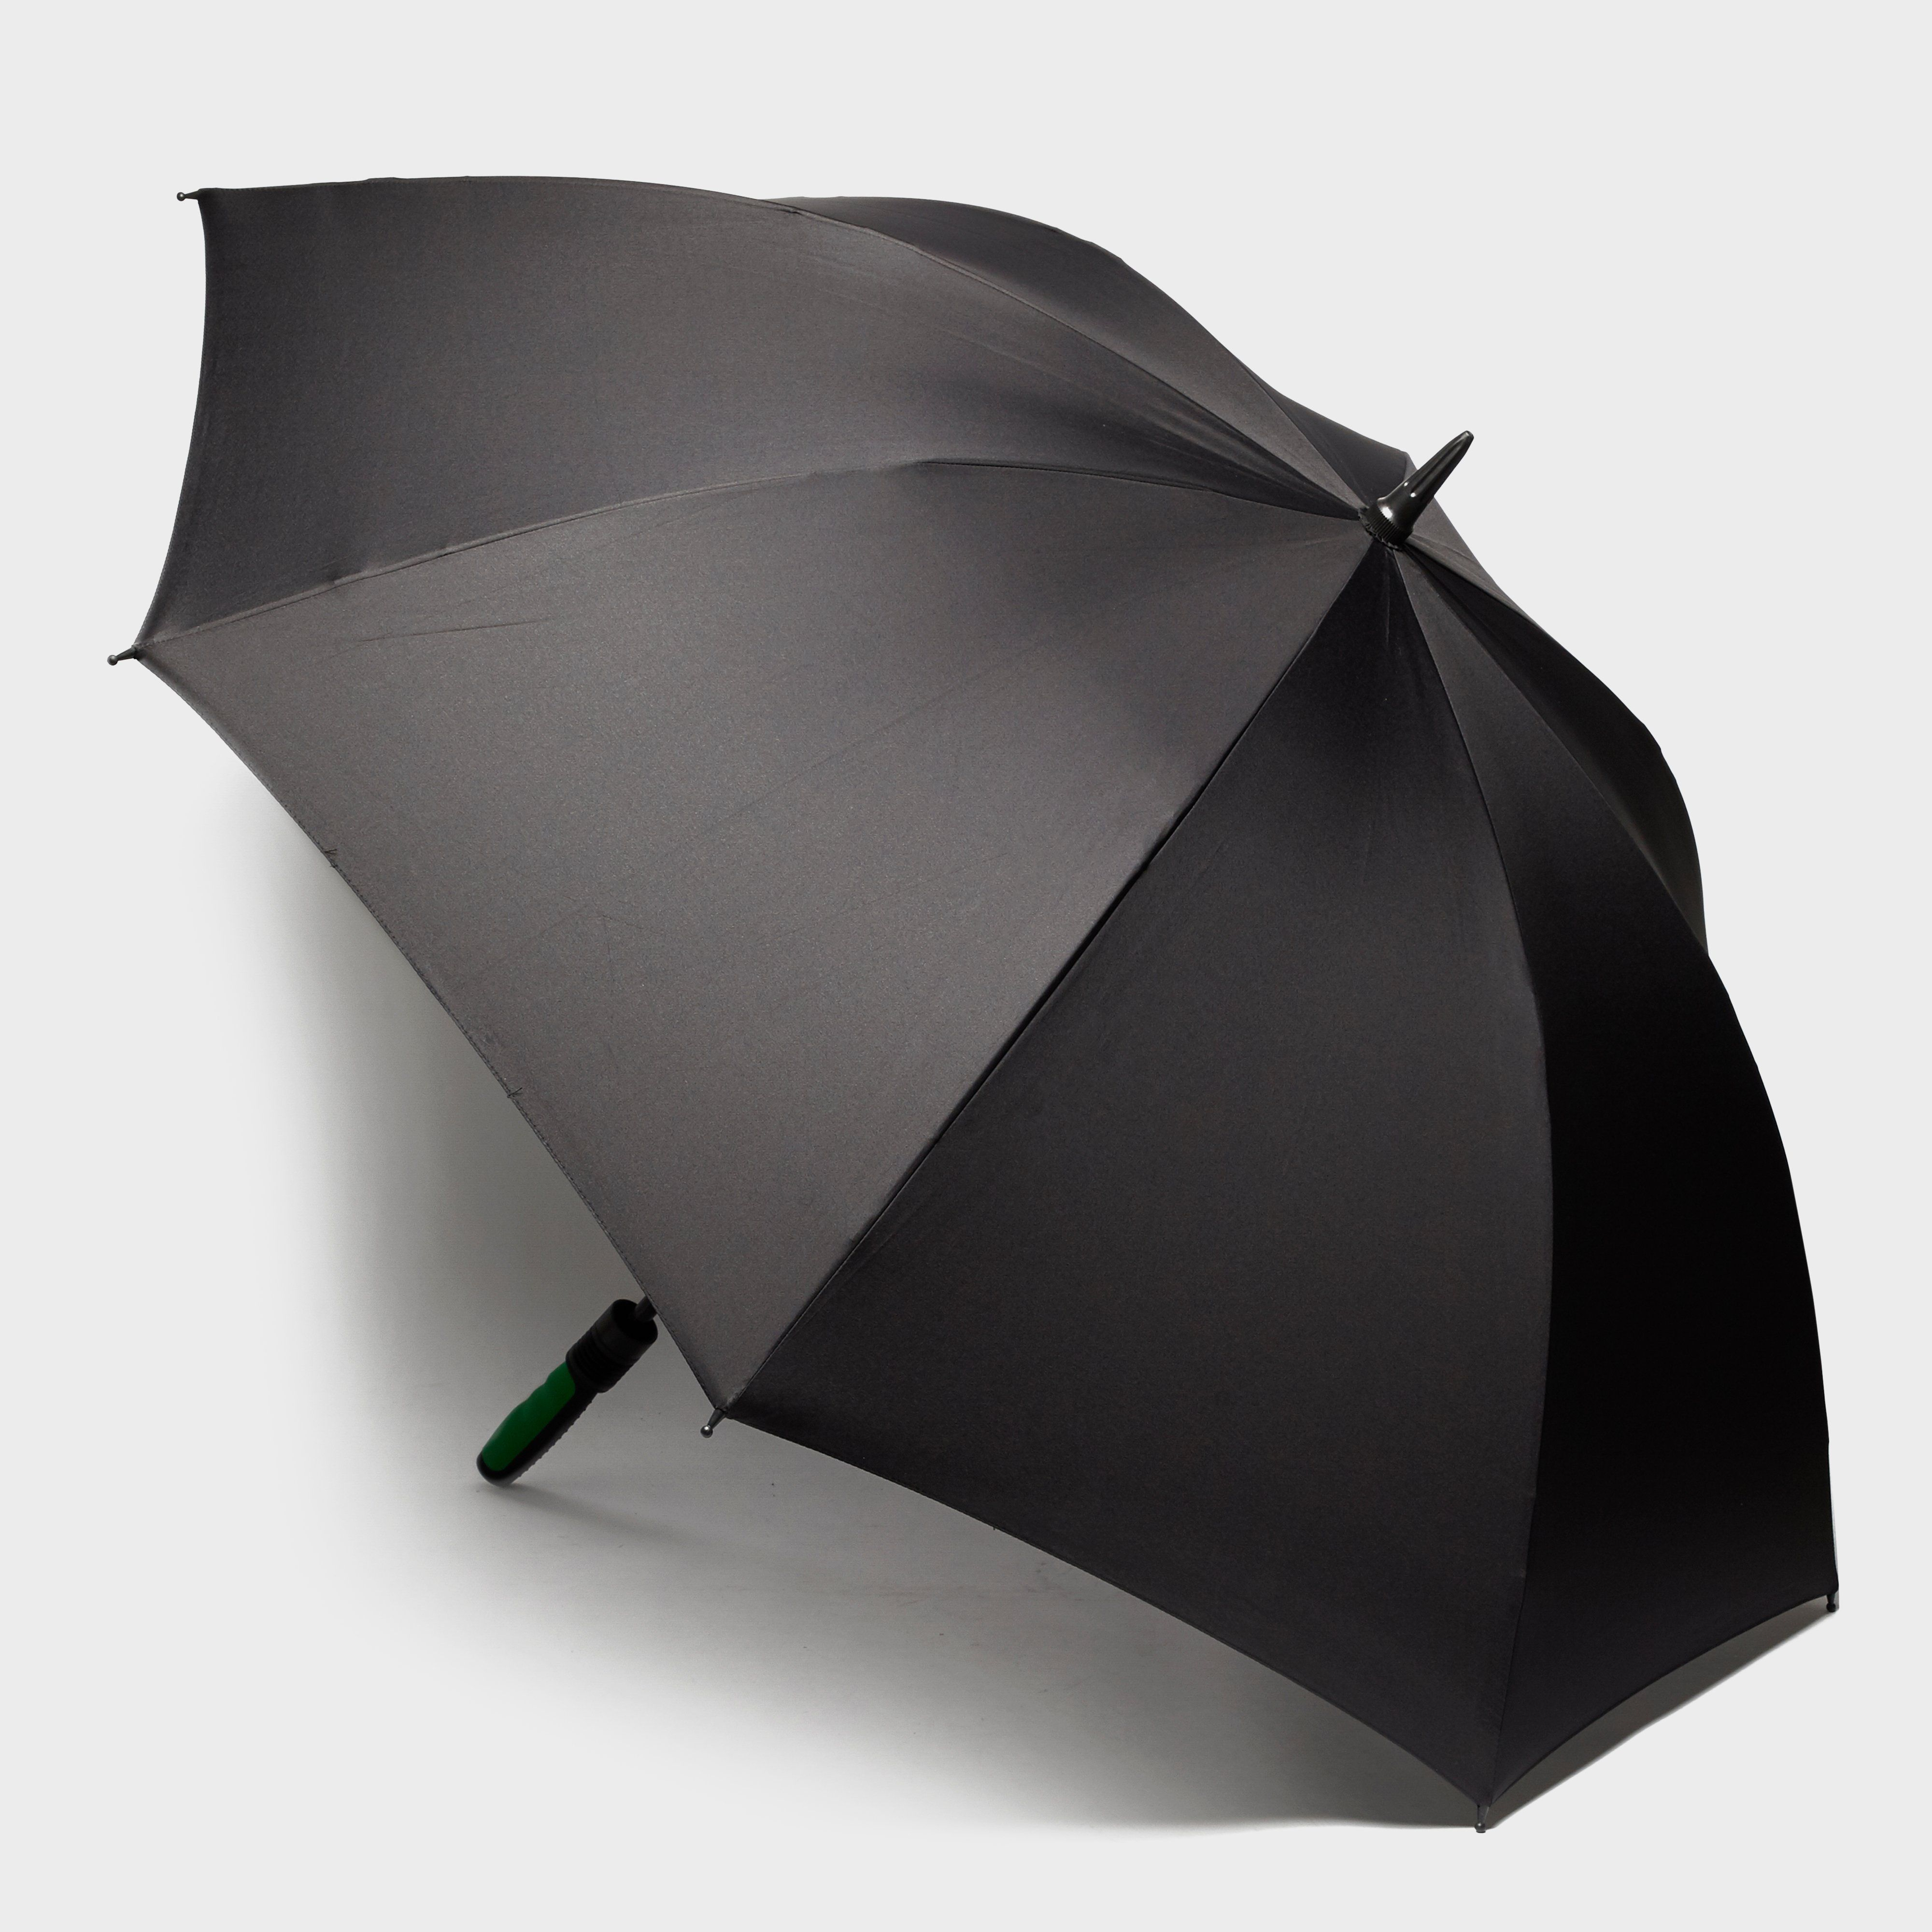 FULTON Cyclone Umbrella